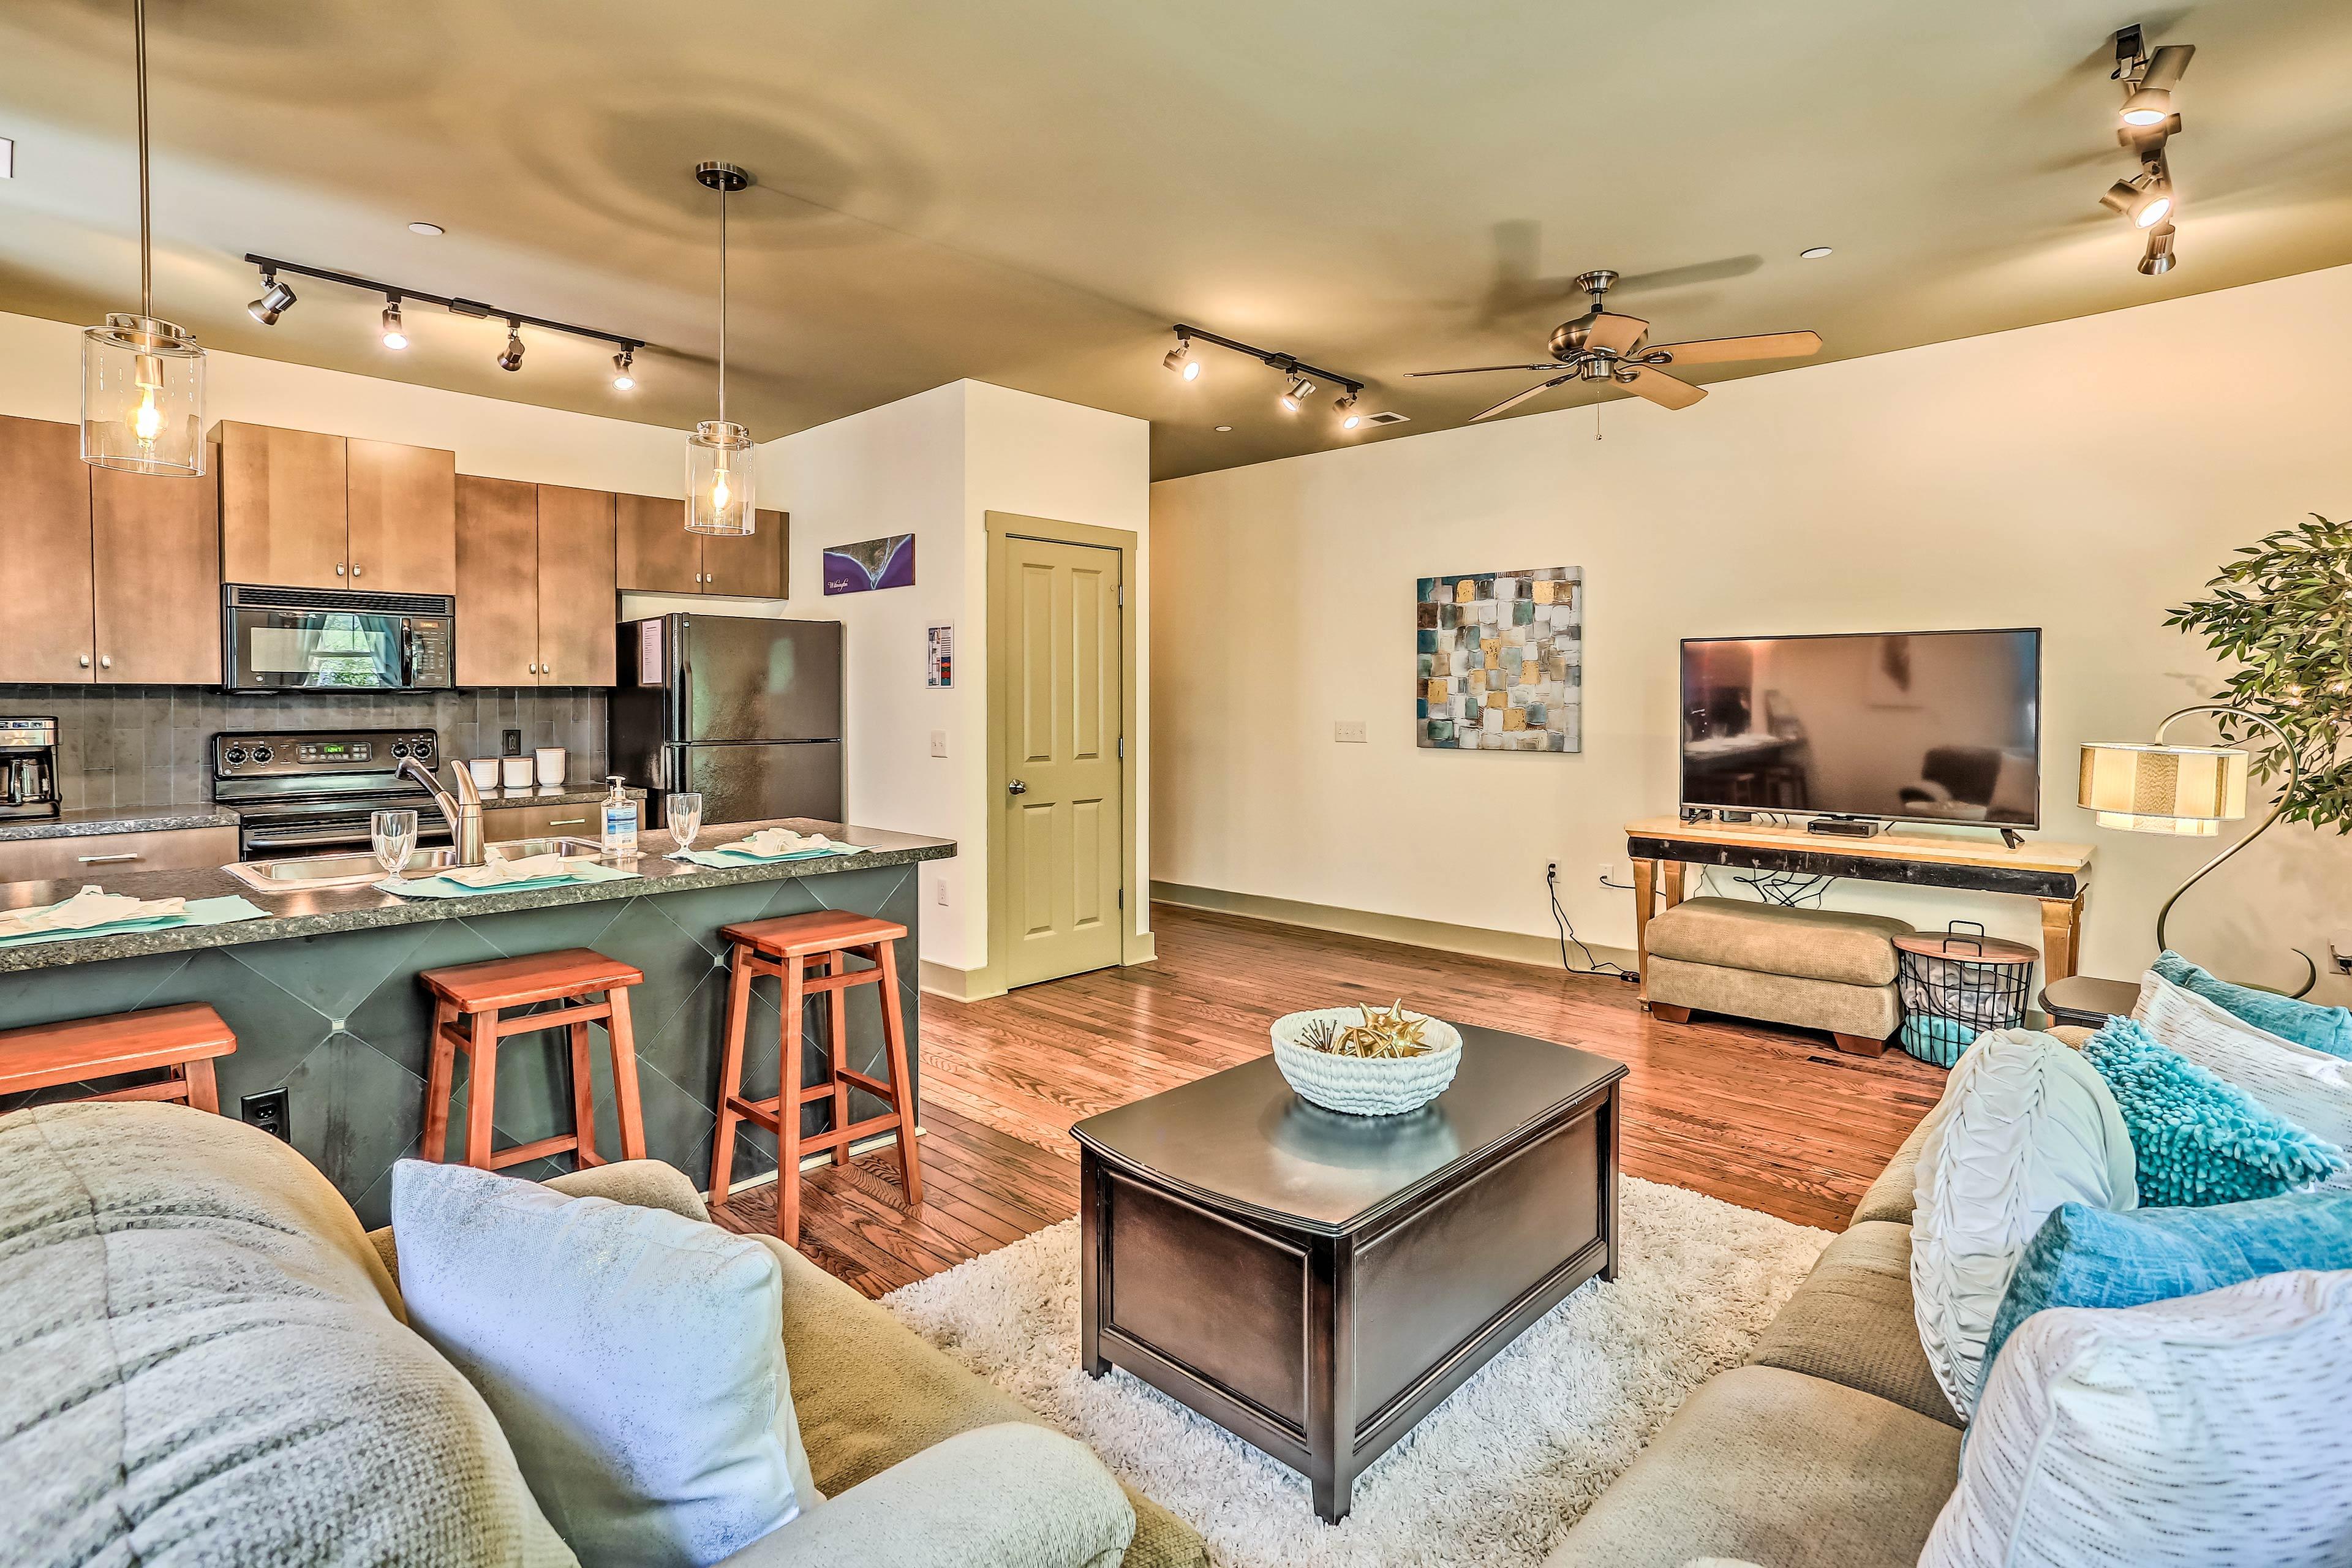 Enjoy modern comforts in this 2-bedroom, 2-bath Downtown Wilmington condo!